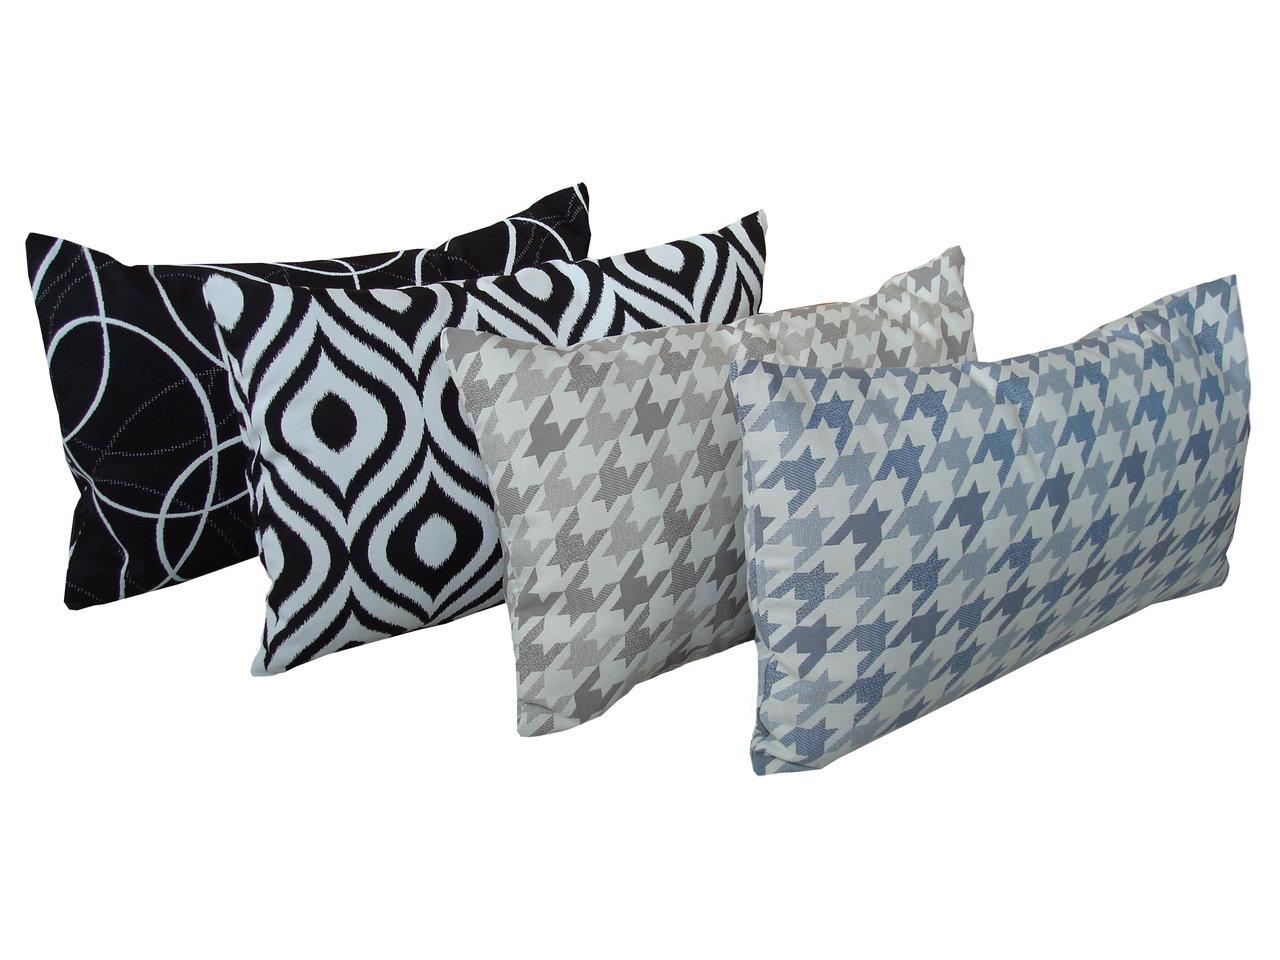 kissenh lle outdoor 50 x 30 cm bequemer sitzen. Black Bedroom Furniture Sets. Home Design Ideas